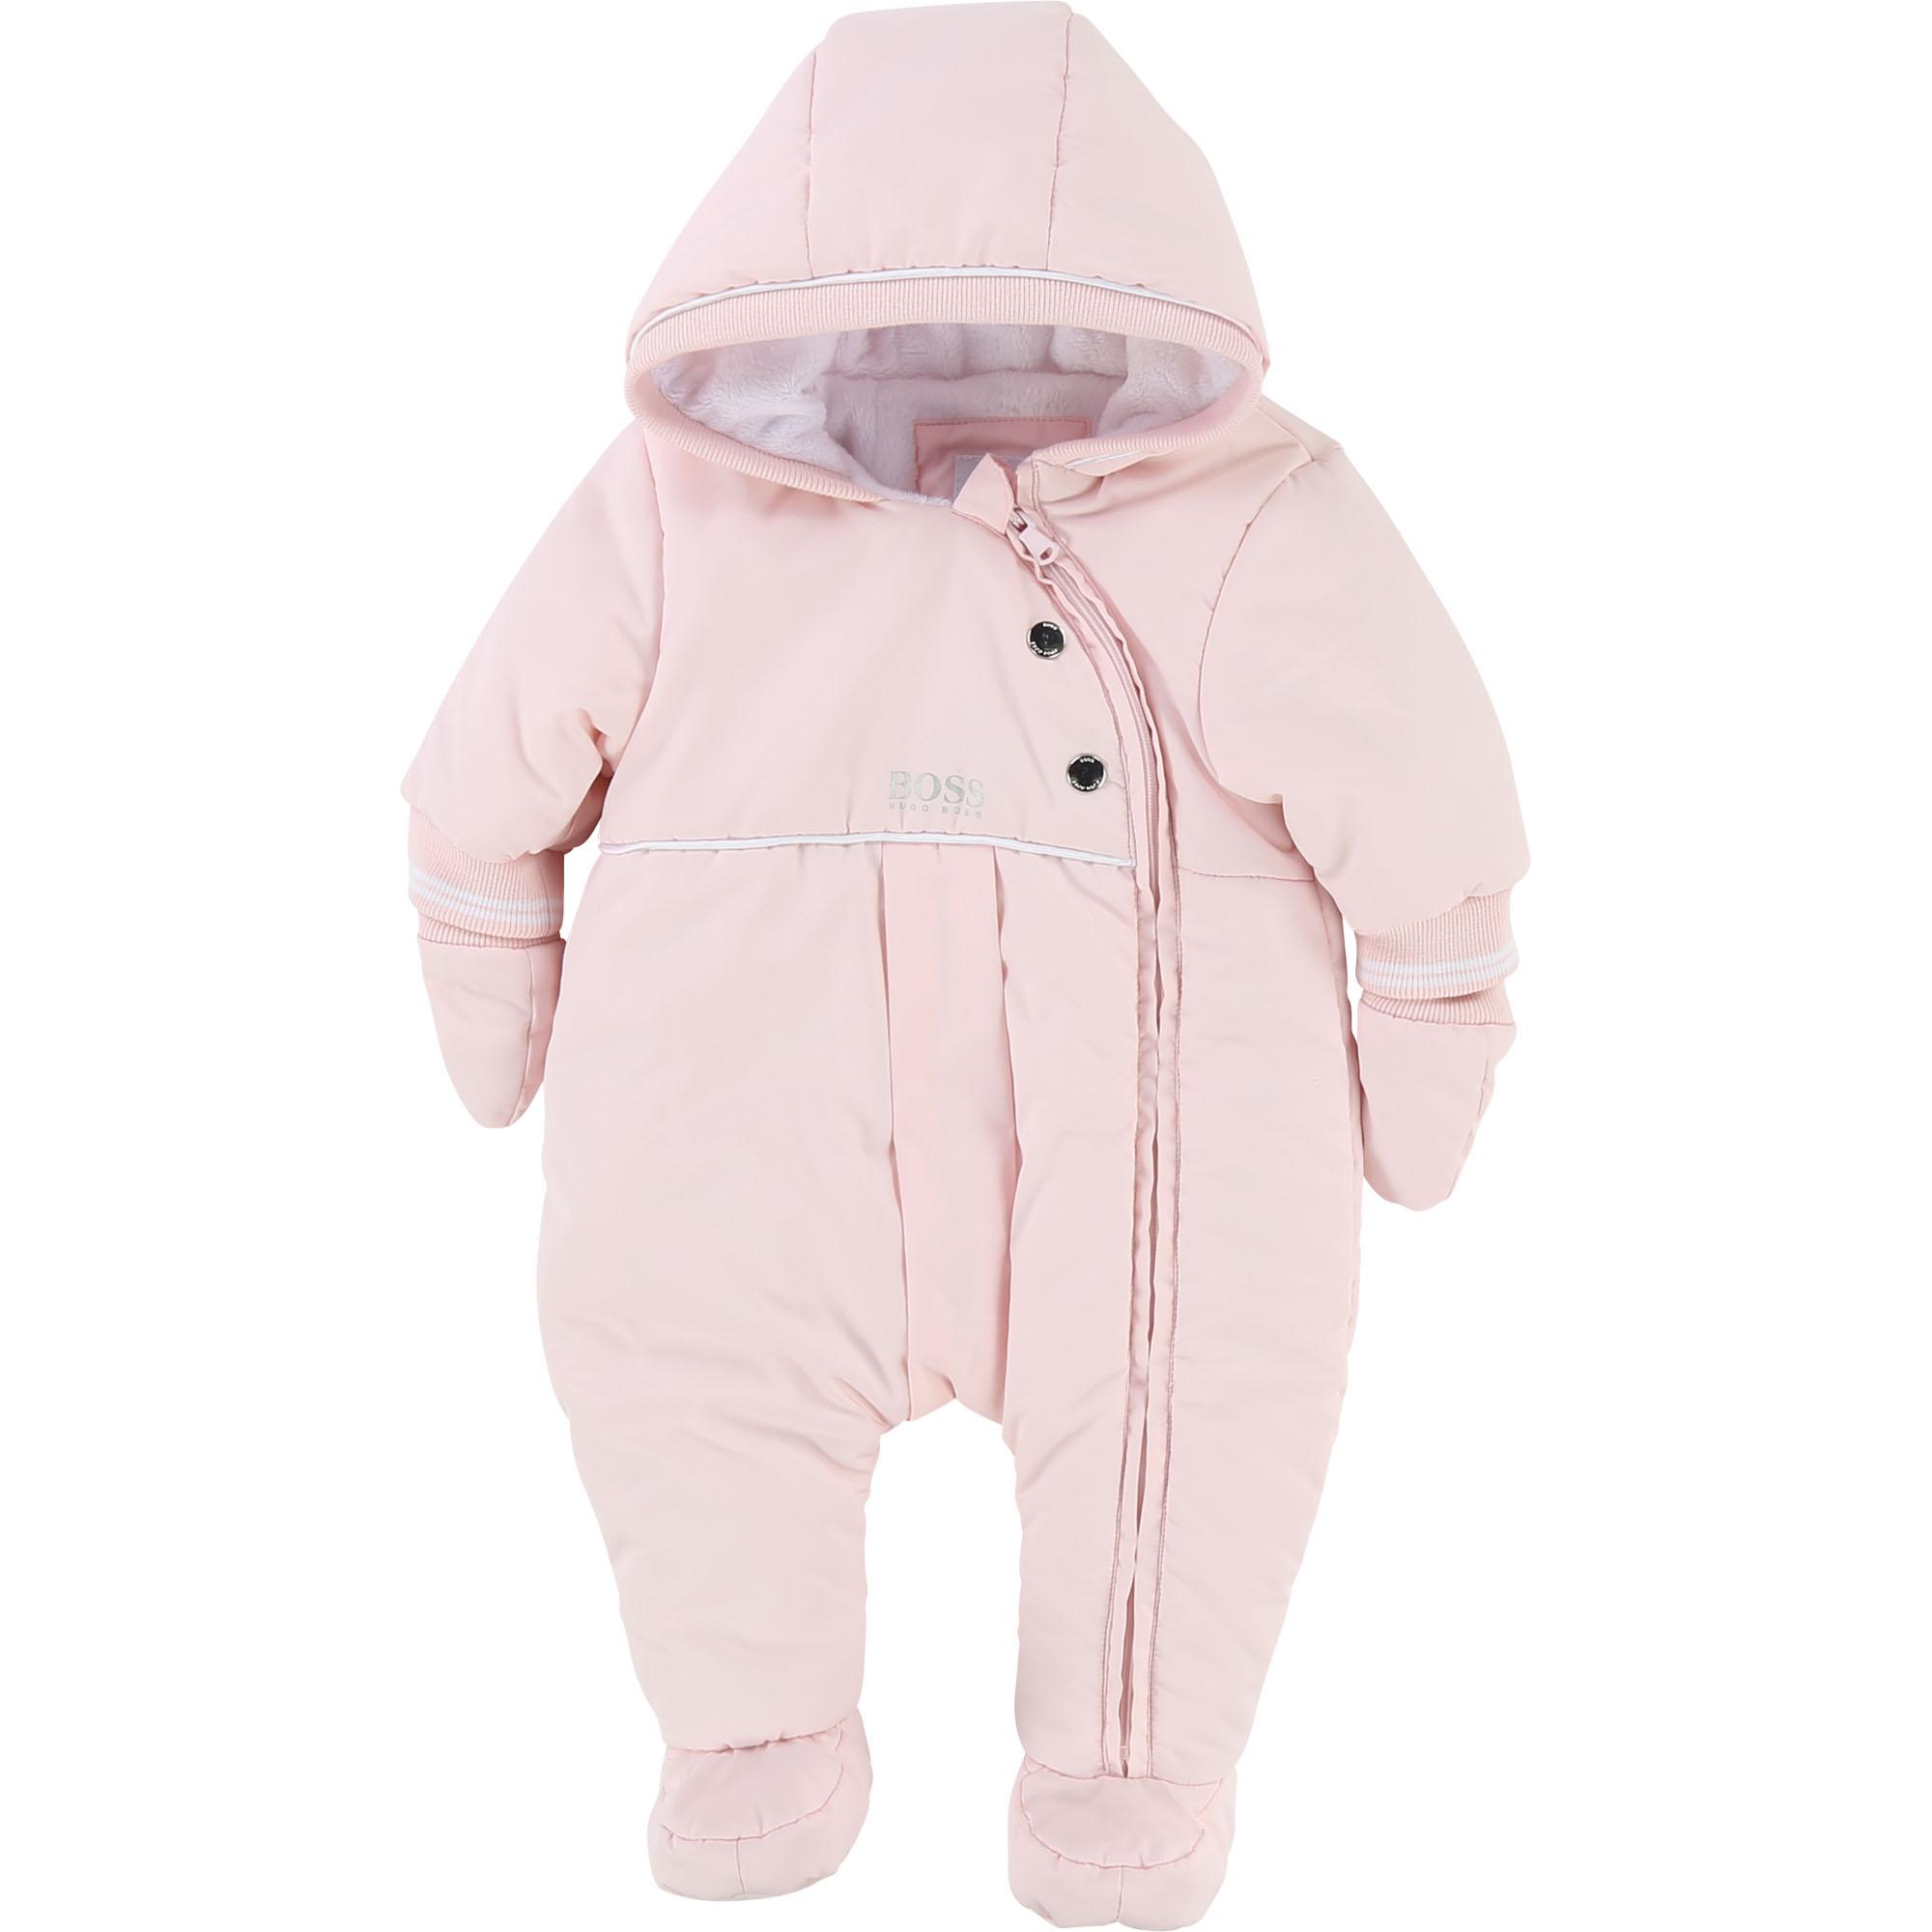 Boss Baby Schneenazug in rosa